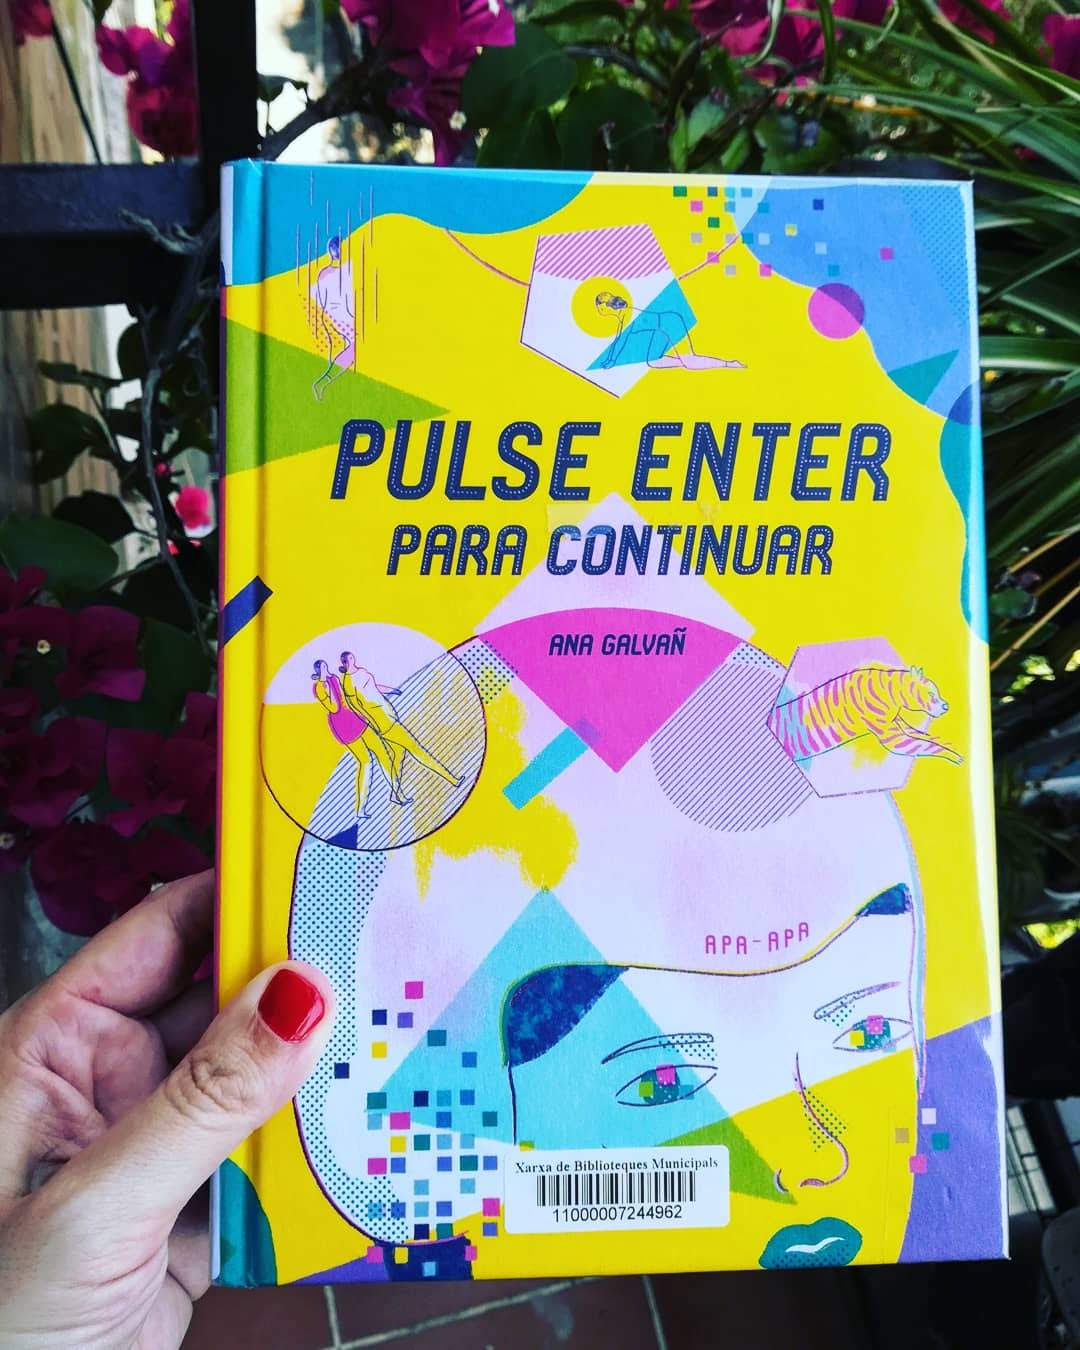 Pulse Enter Para Continuar 2018 Ana Galvañ Pisycaca